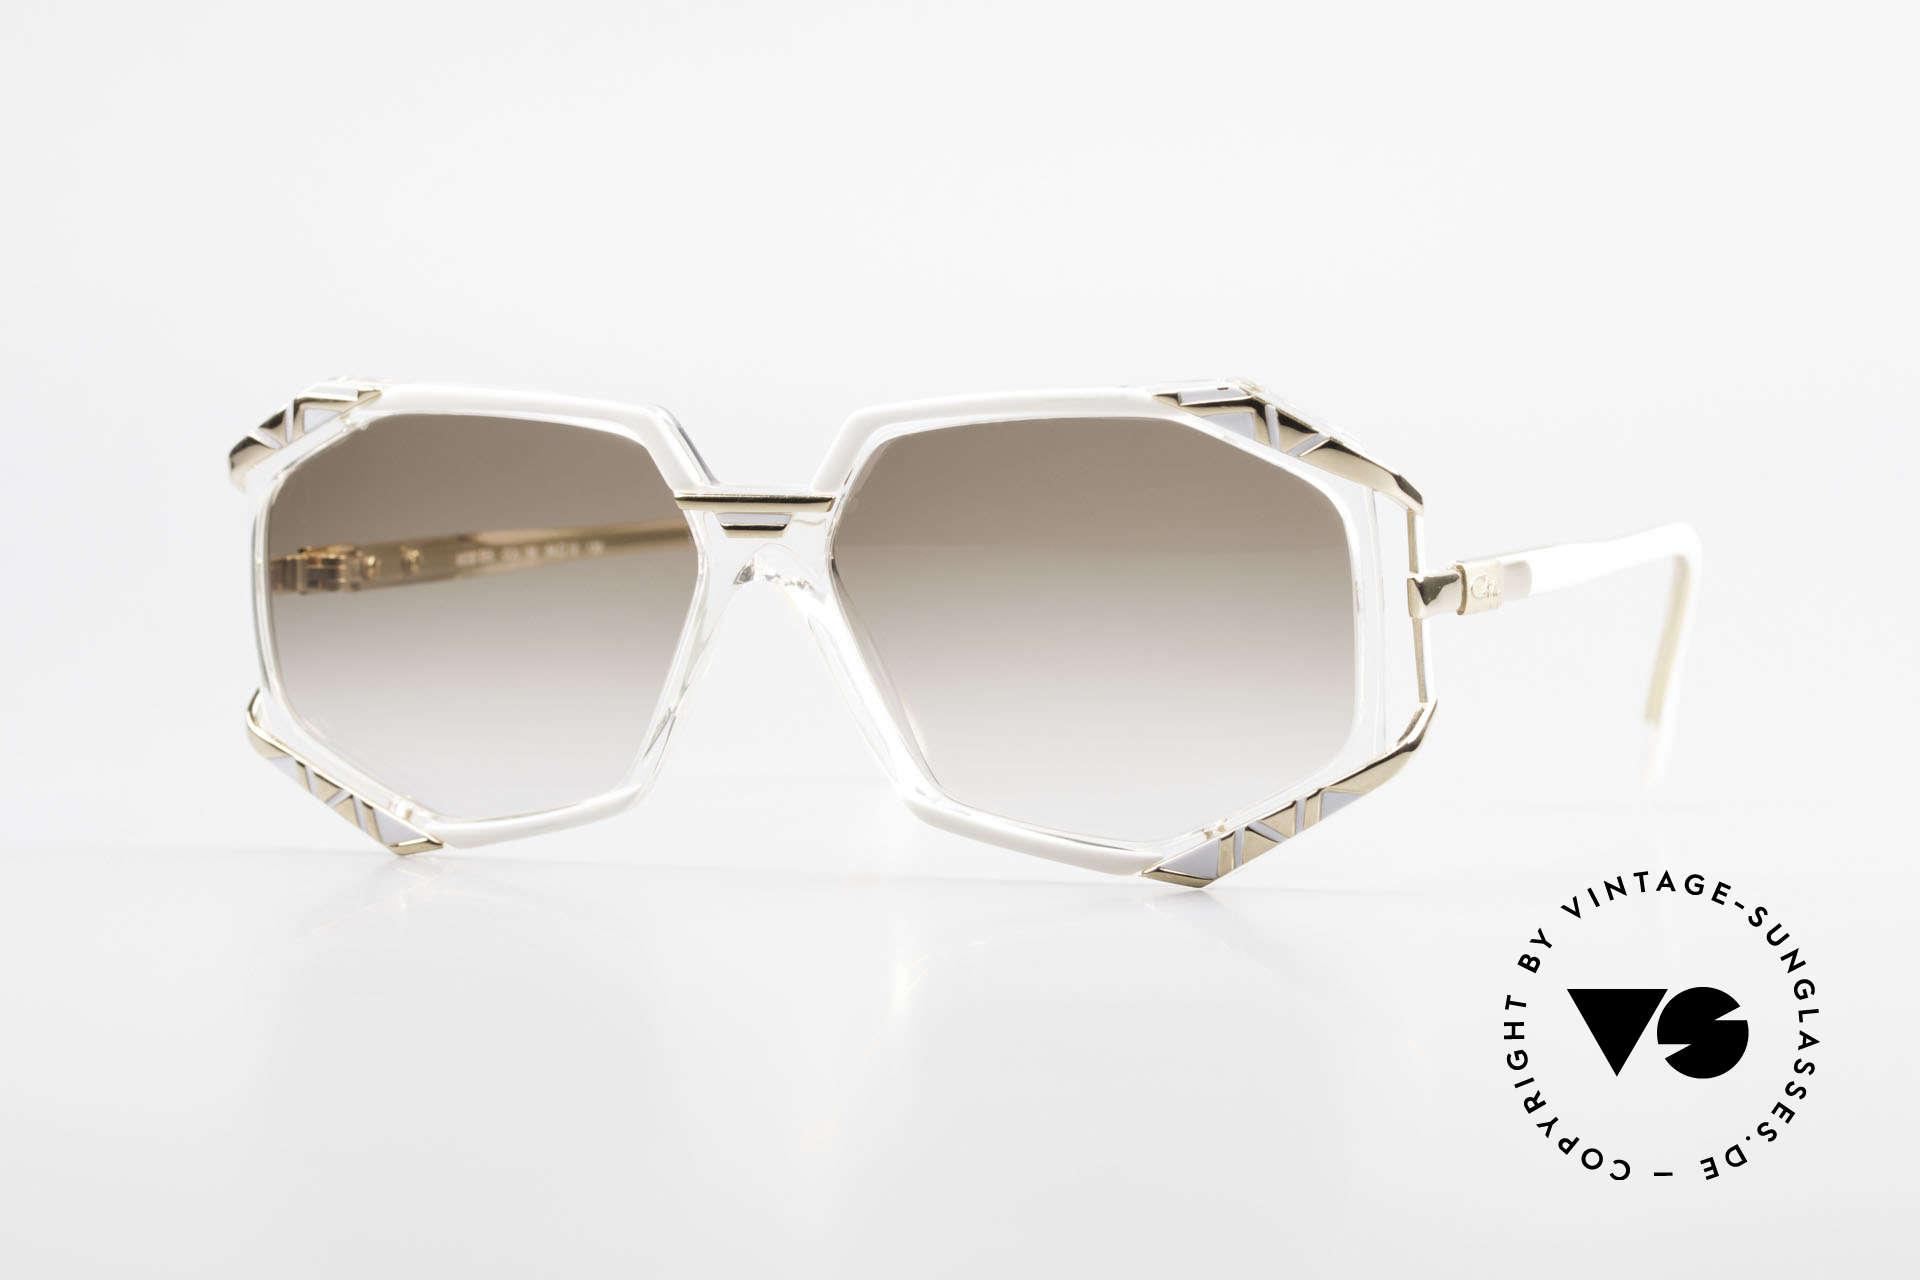 Cazal 355 Spectacular 90s Vintage Cazal, extraordinary Cazal designer frame from the early 90's, Made for Women